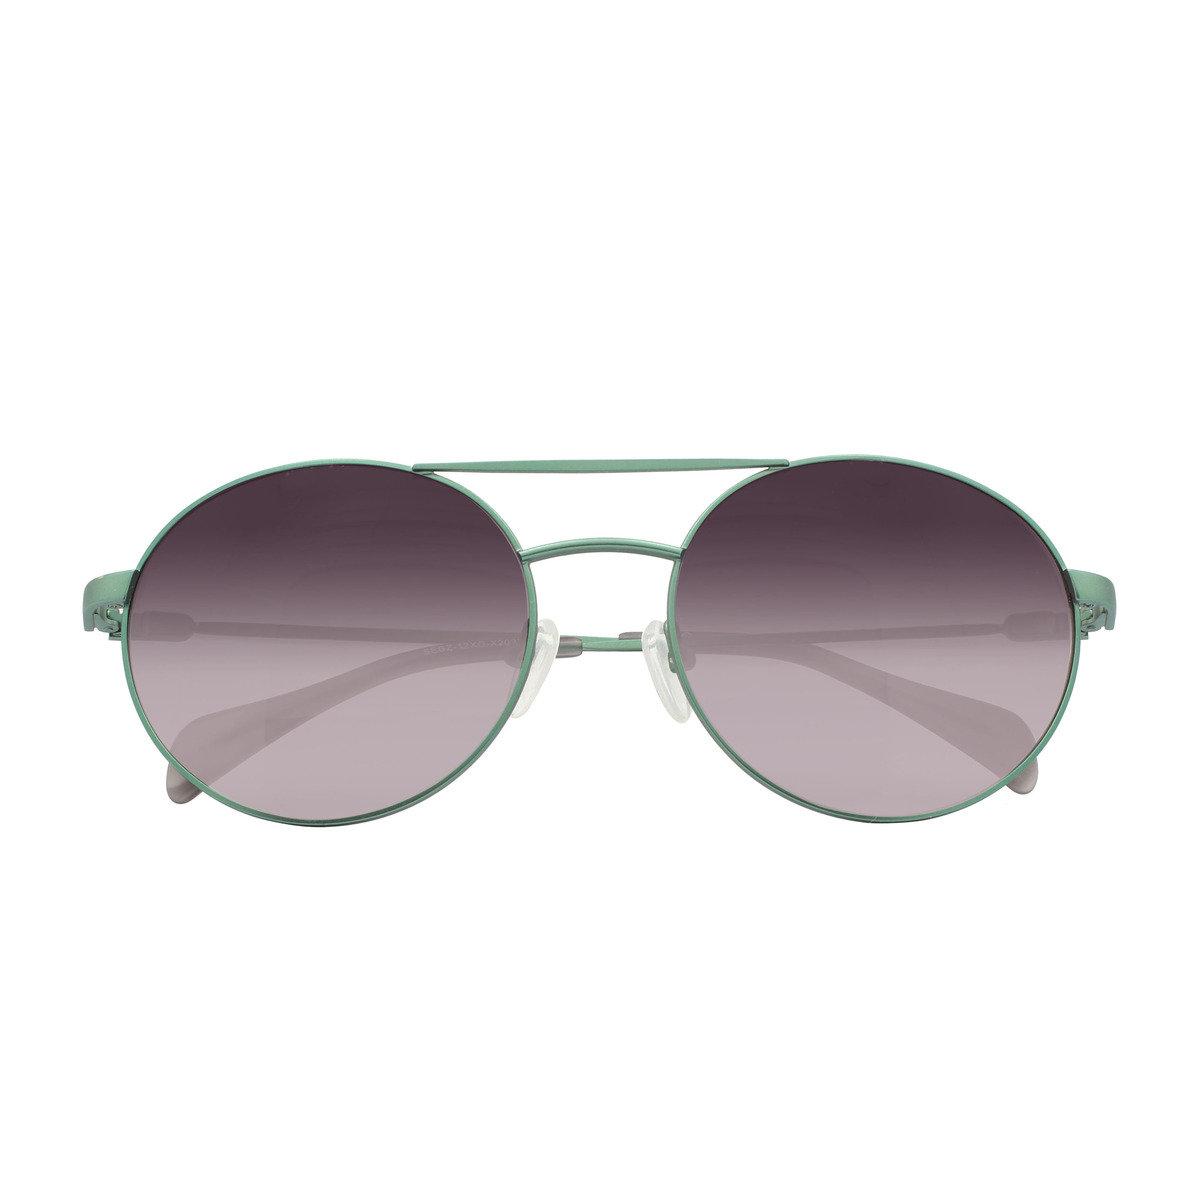 eGG 圓框金屬防UV淺綠太陽眼鏡